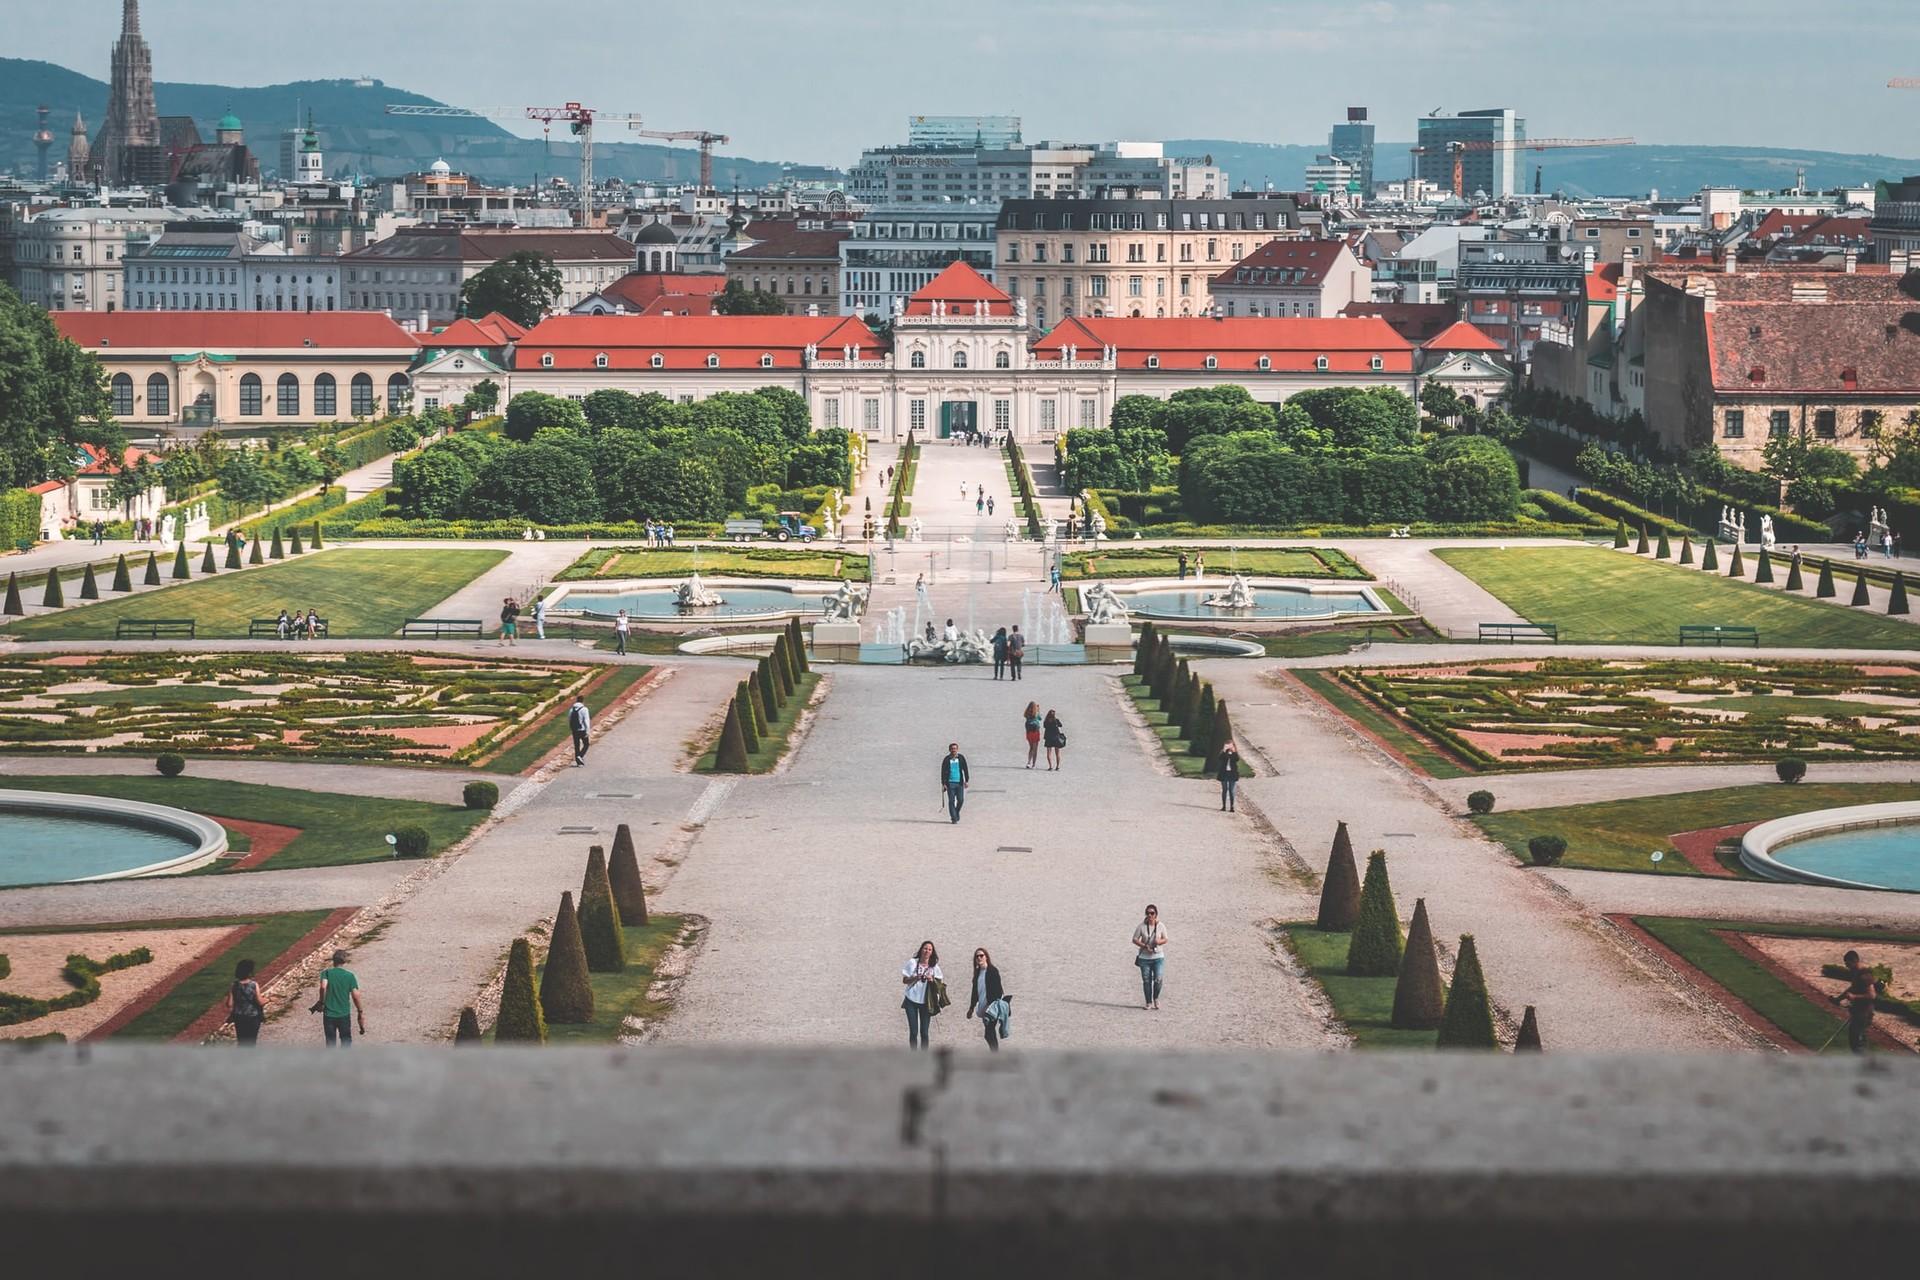 Esperienza a Vienna, Austria di Eva